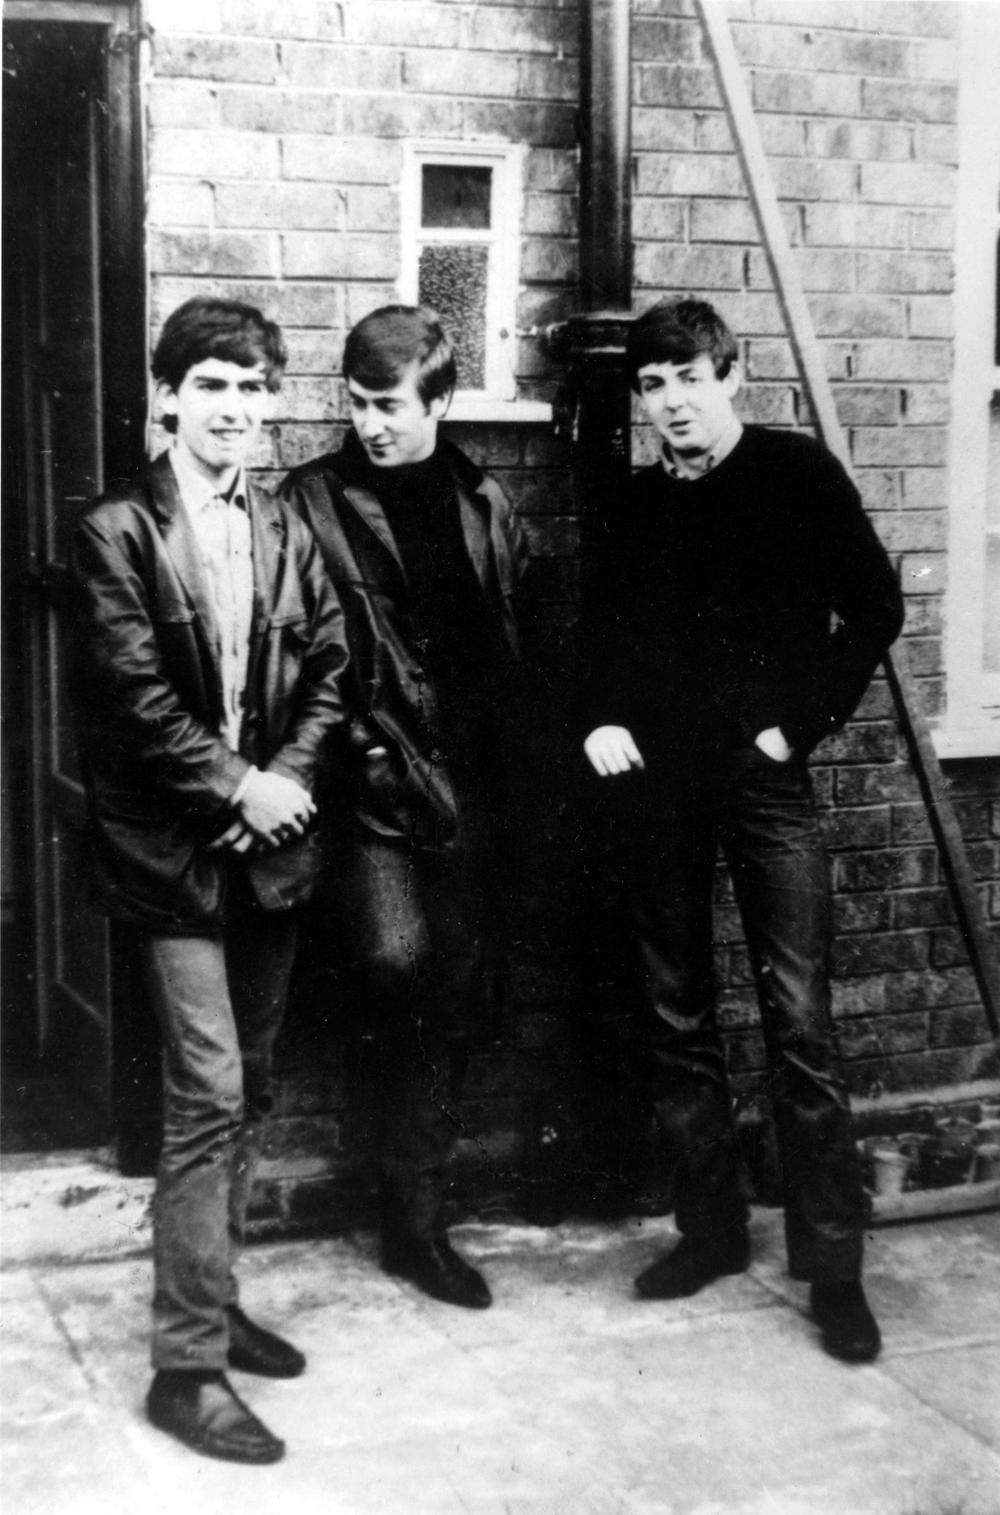 George Harrison, John Lennon and Paul McCartney in Liverpool, 1962.